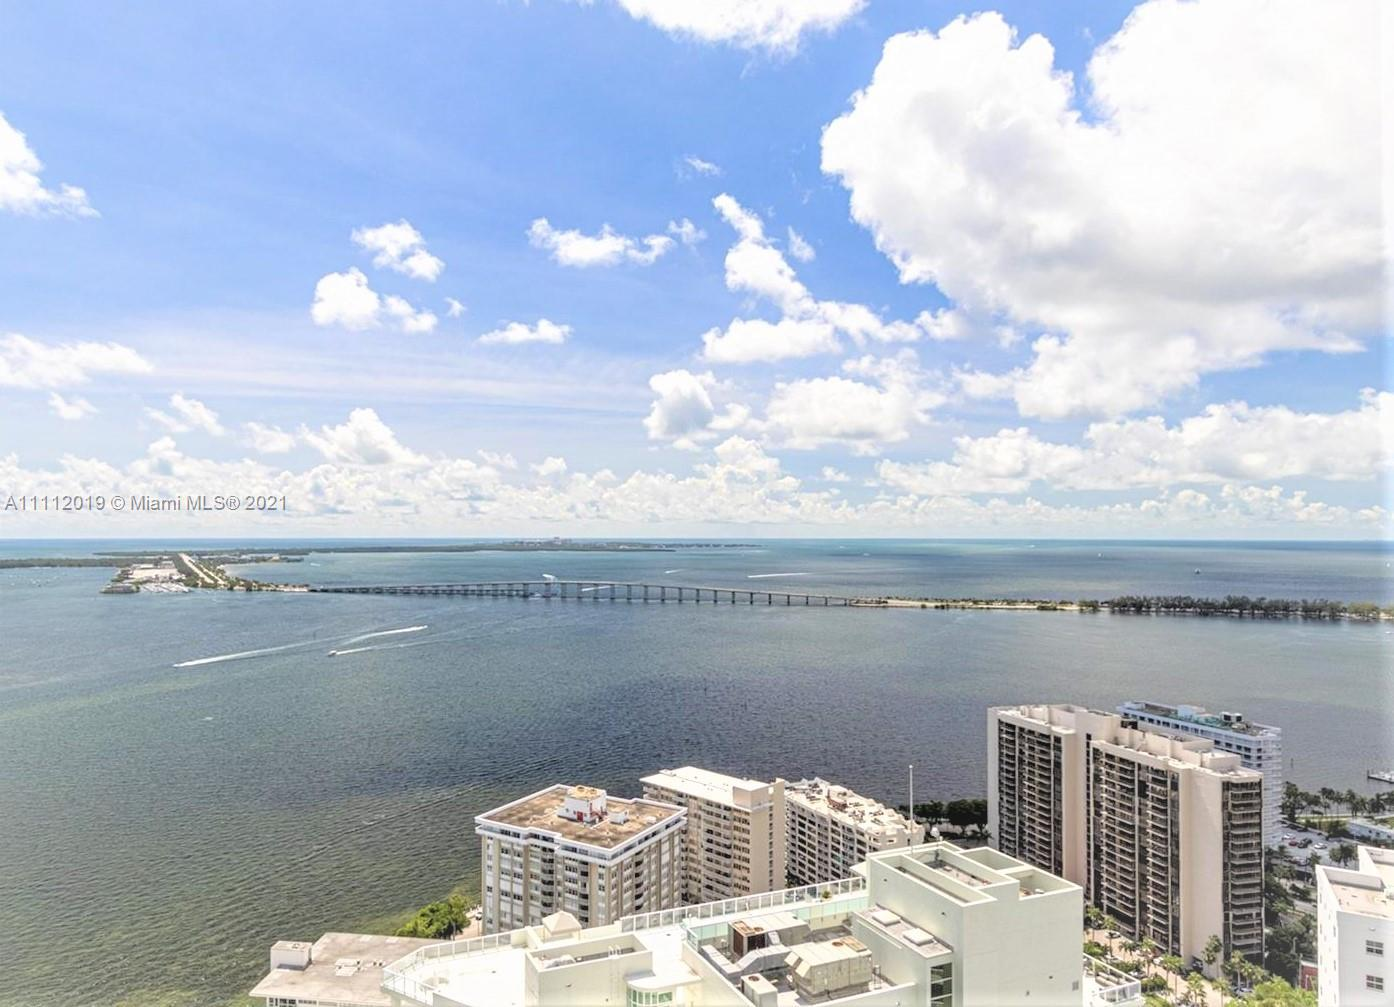 1300 Brickell Bay Dr Unit 3903, Miami, Florida 33131